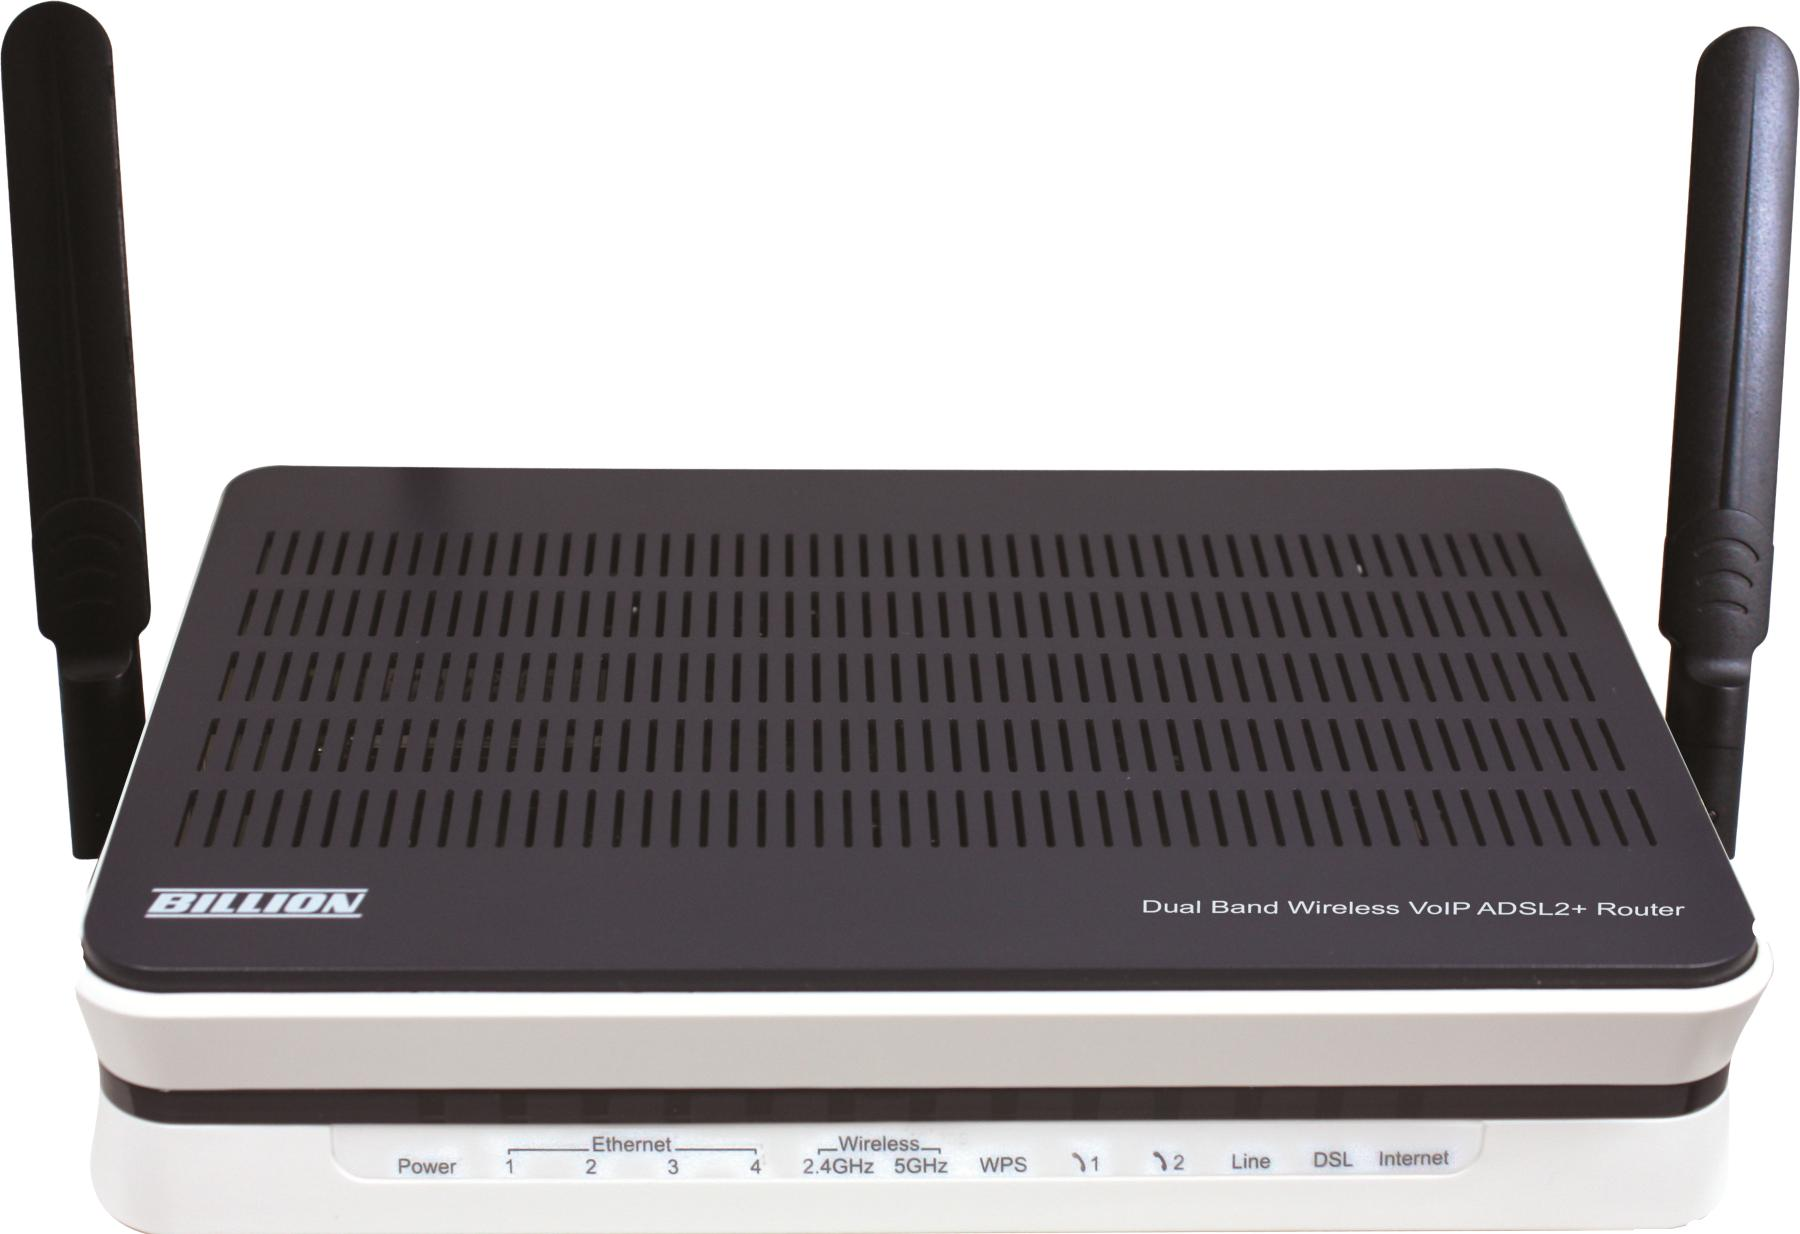 Billion BiPAC 7800NXL